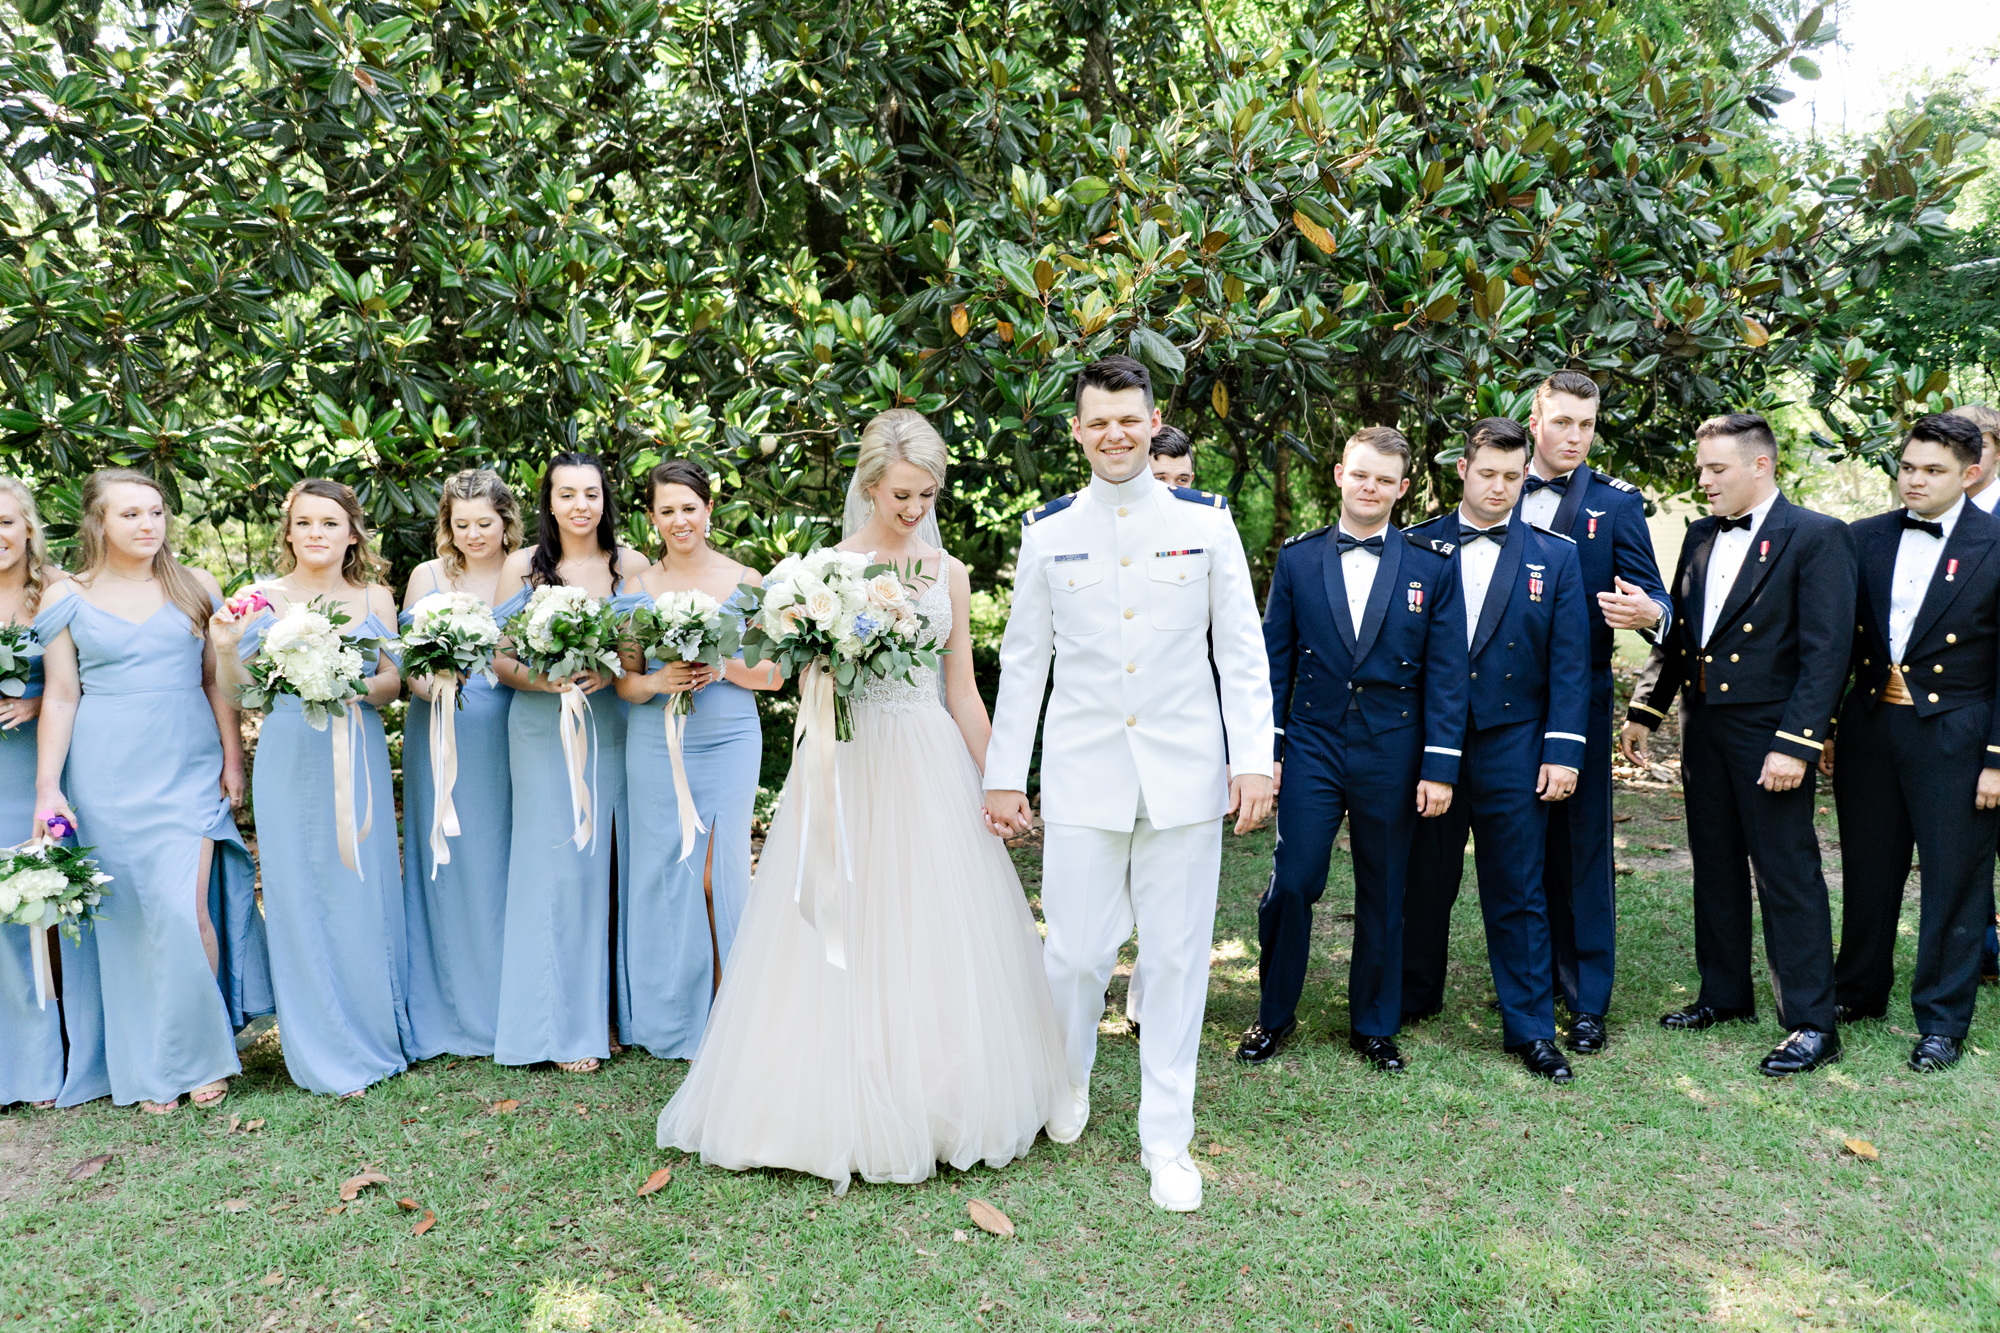 Alabama-Photographers-Nick-Drollette-Wedding-Photography-127.jpg